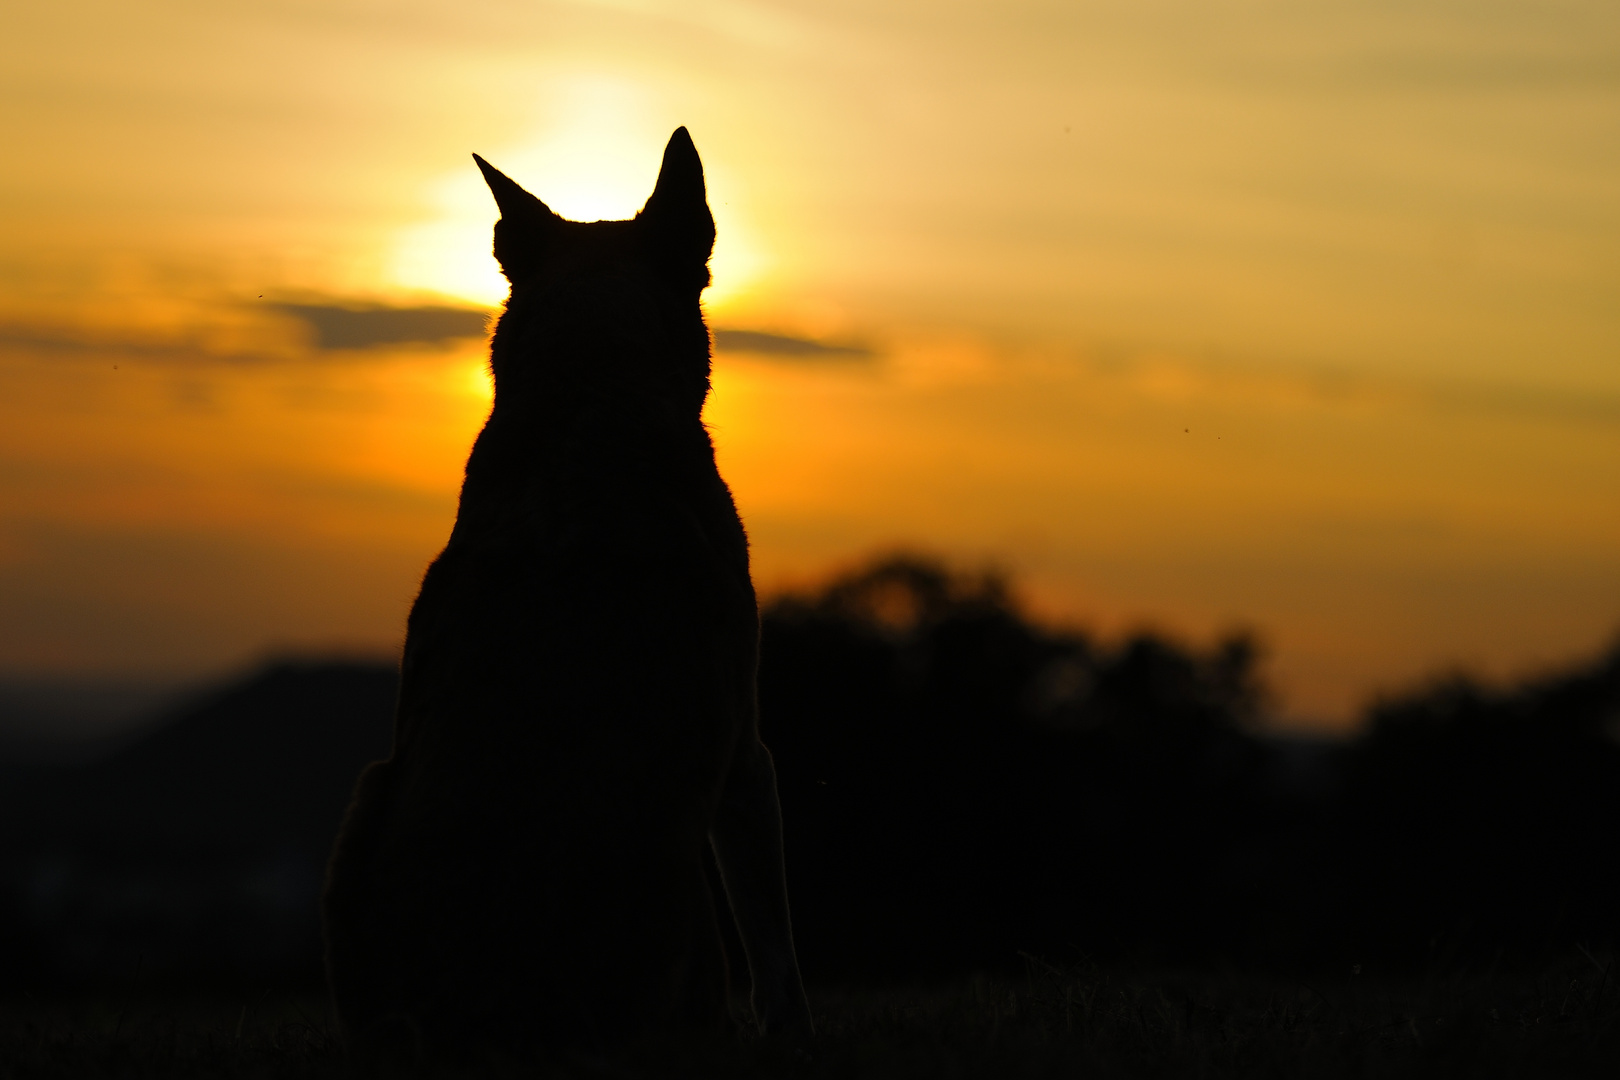 nochmal: Sonnenuntergangfoto